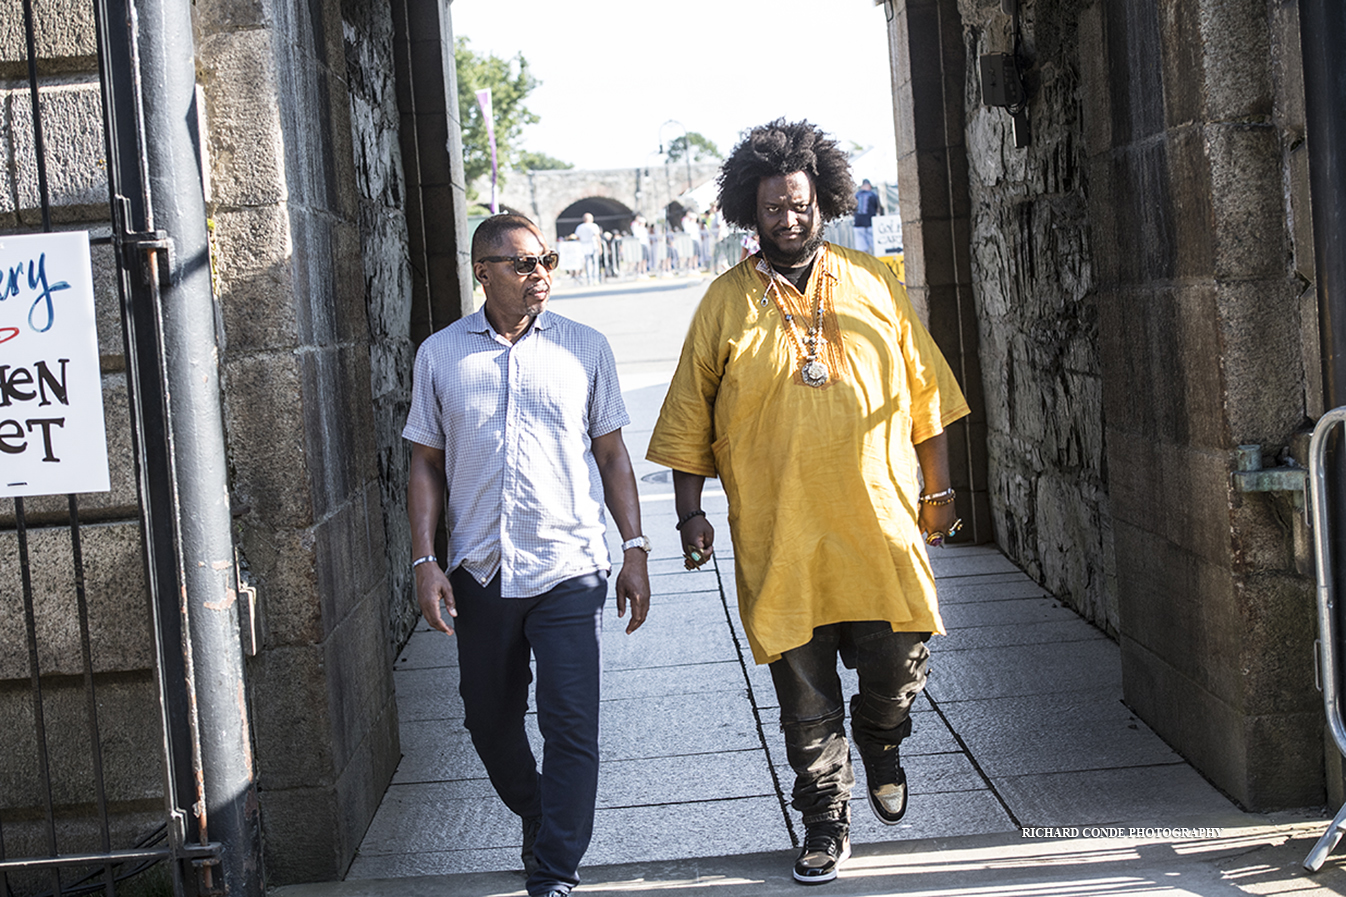 Ravi Coltrane and Kamasi Washington at the 2019 Newport Jazz Festival